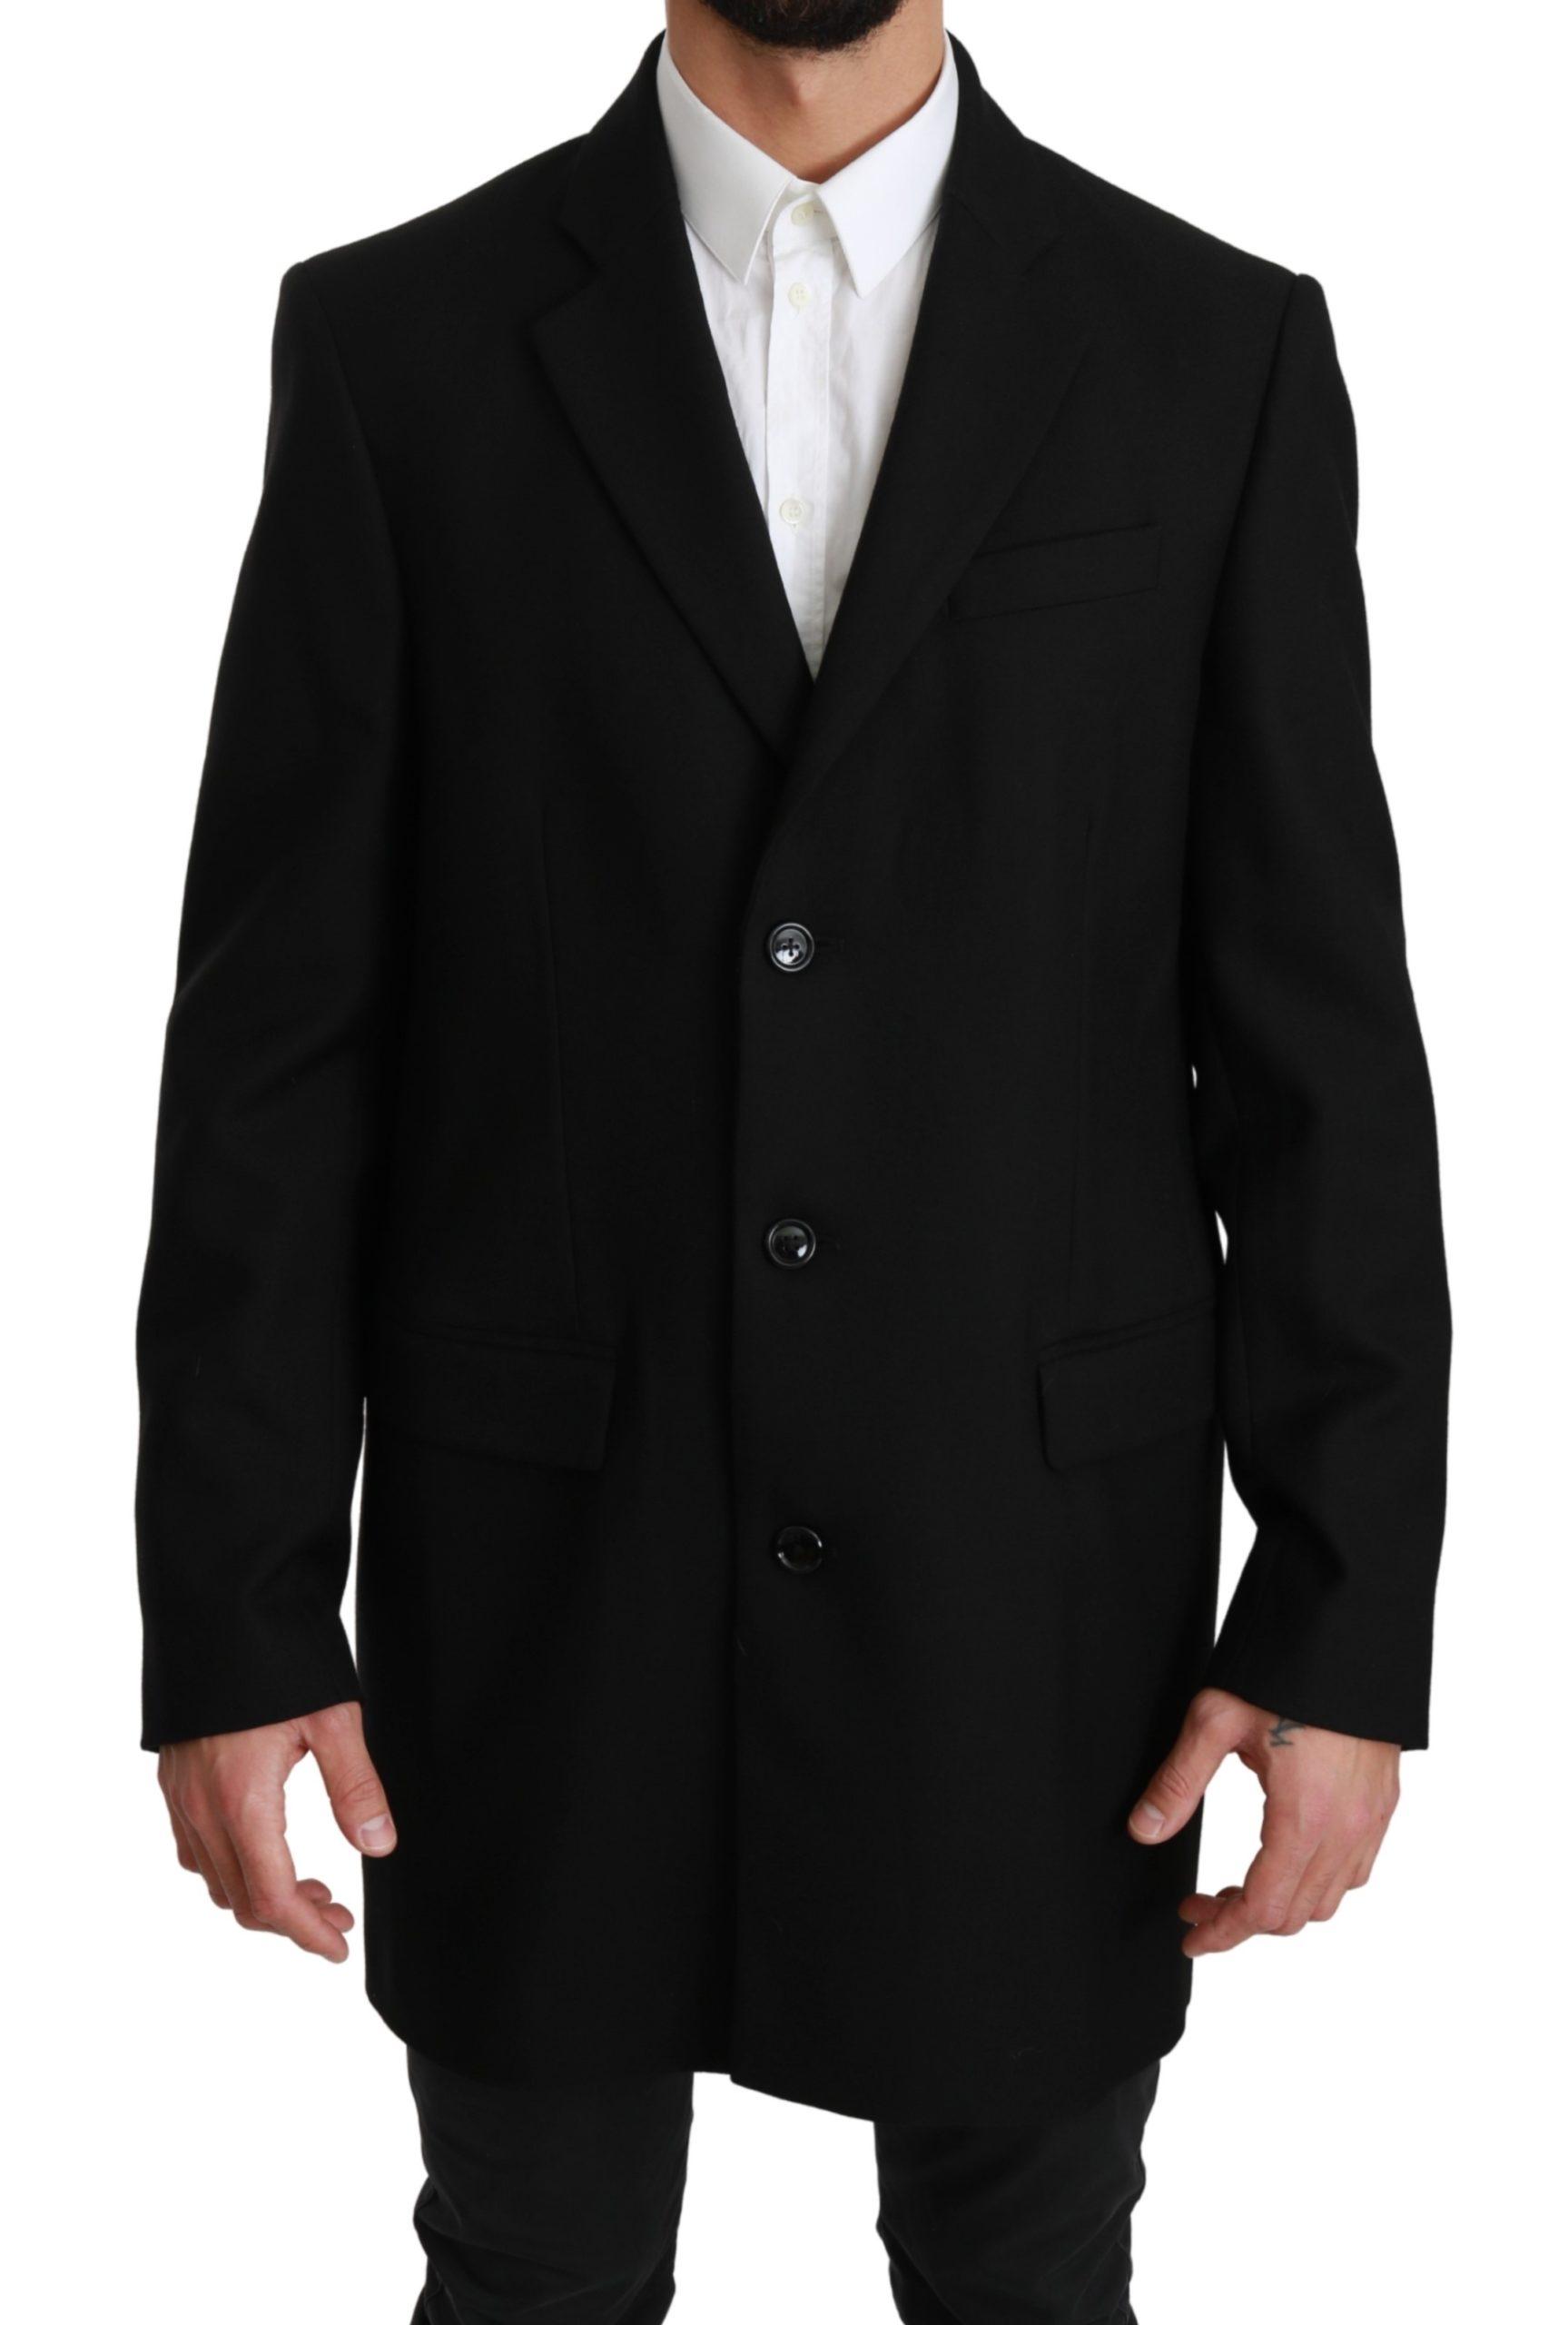 Dolce & Gabbana Men's Wool Blazer Black JKT2591 - IT50 | L